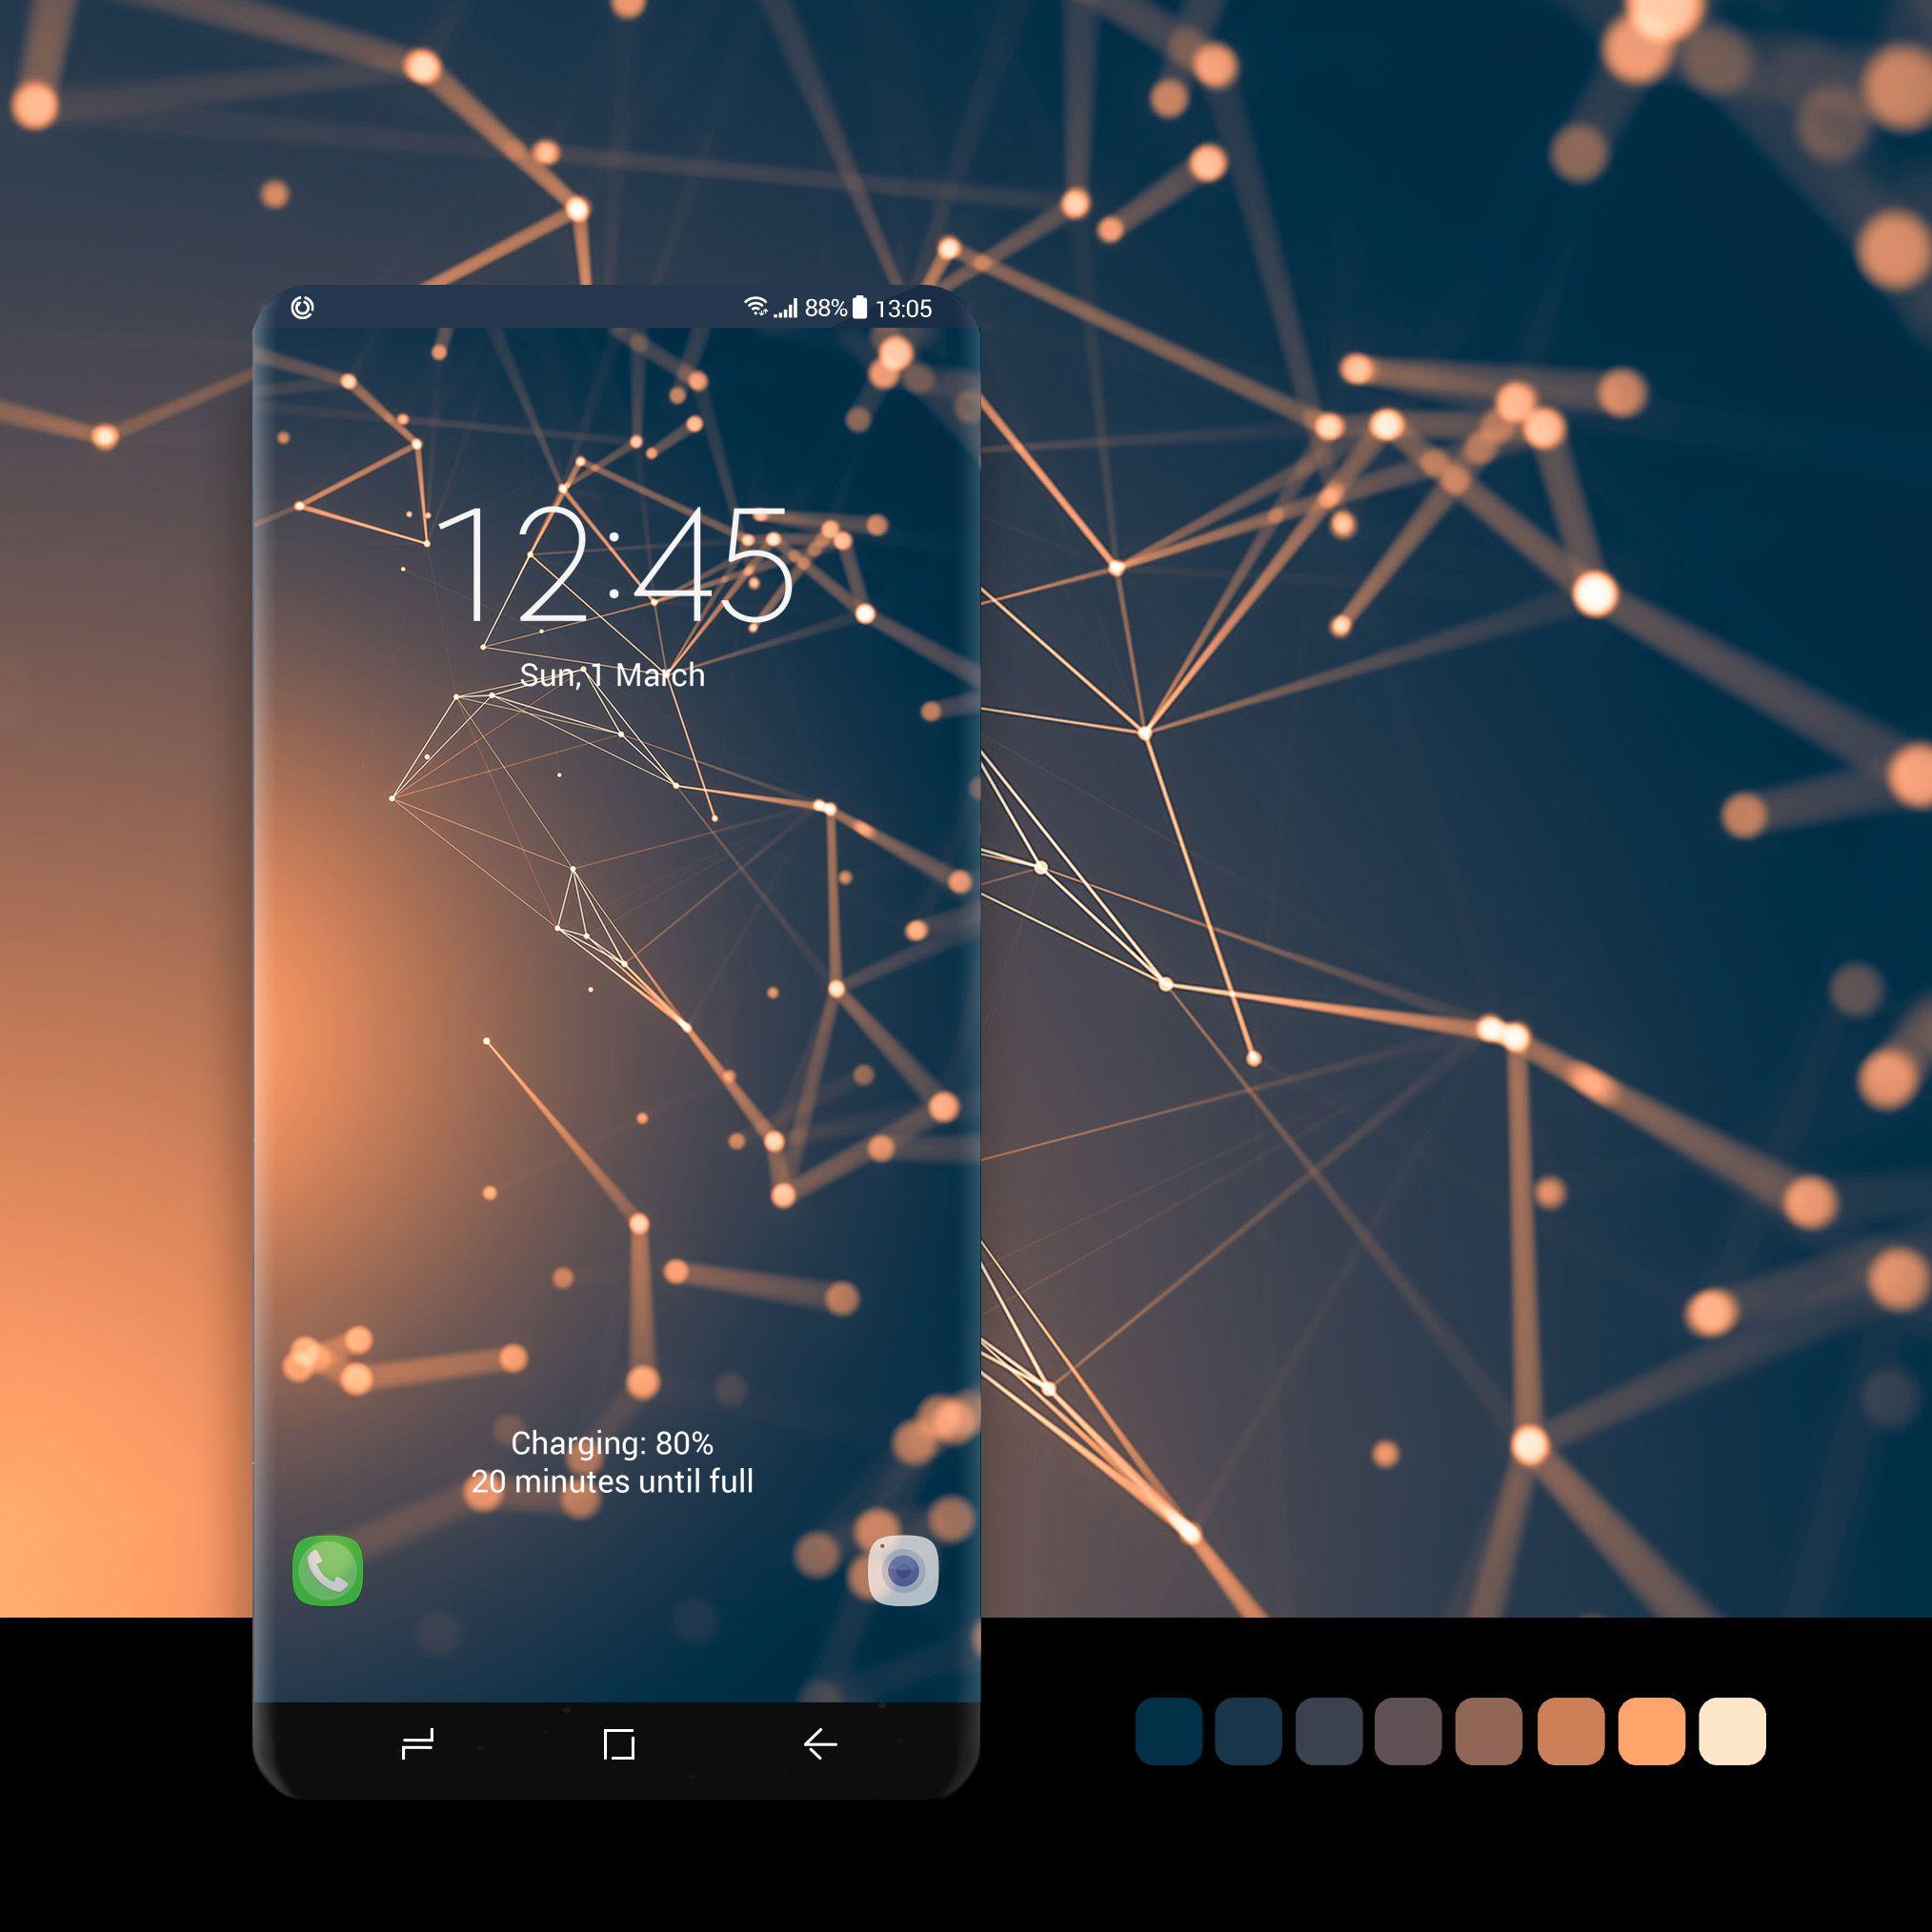 Blurred blockchain wallpaper #wallpaper, #android, #phone